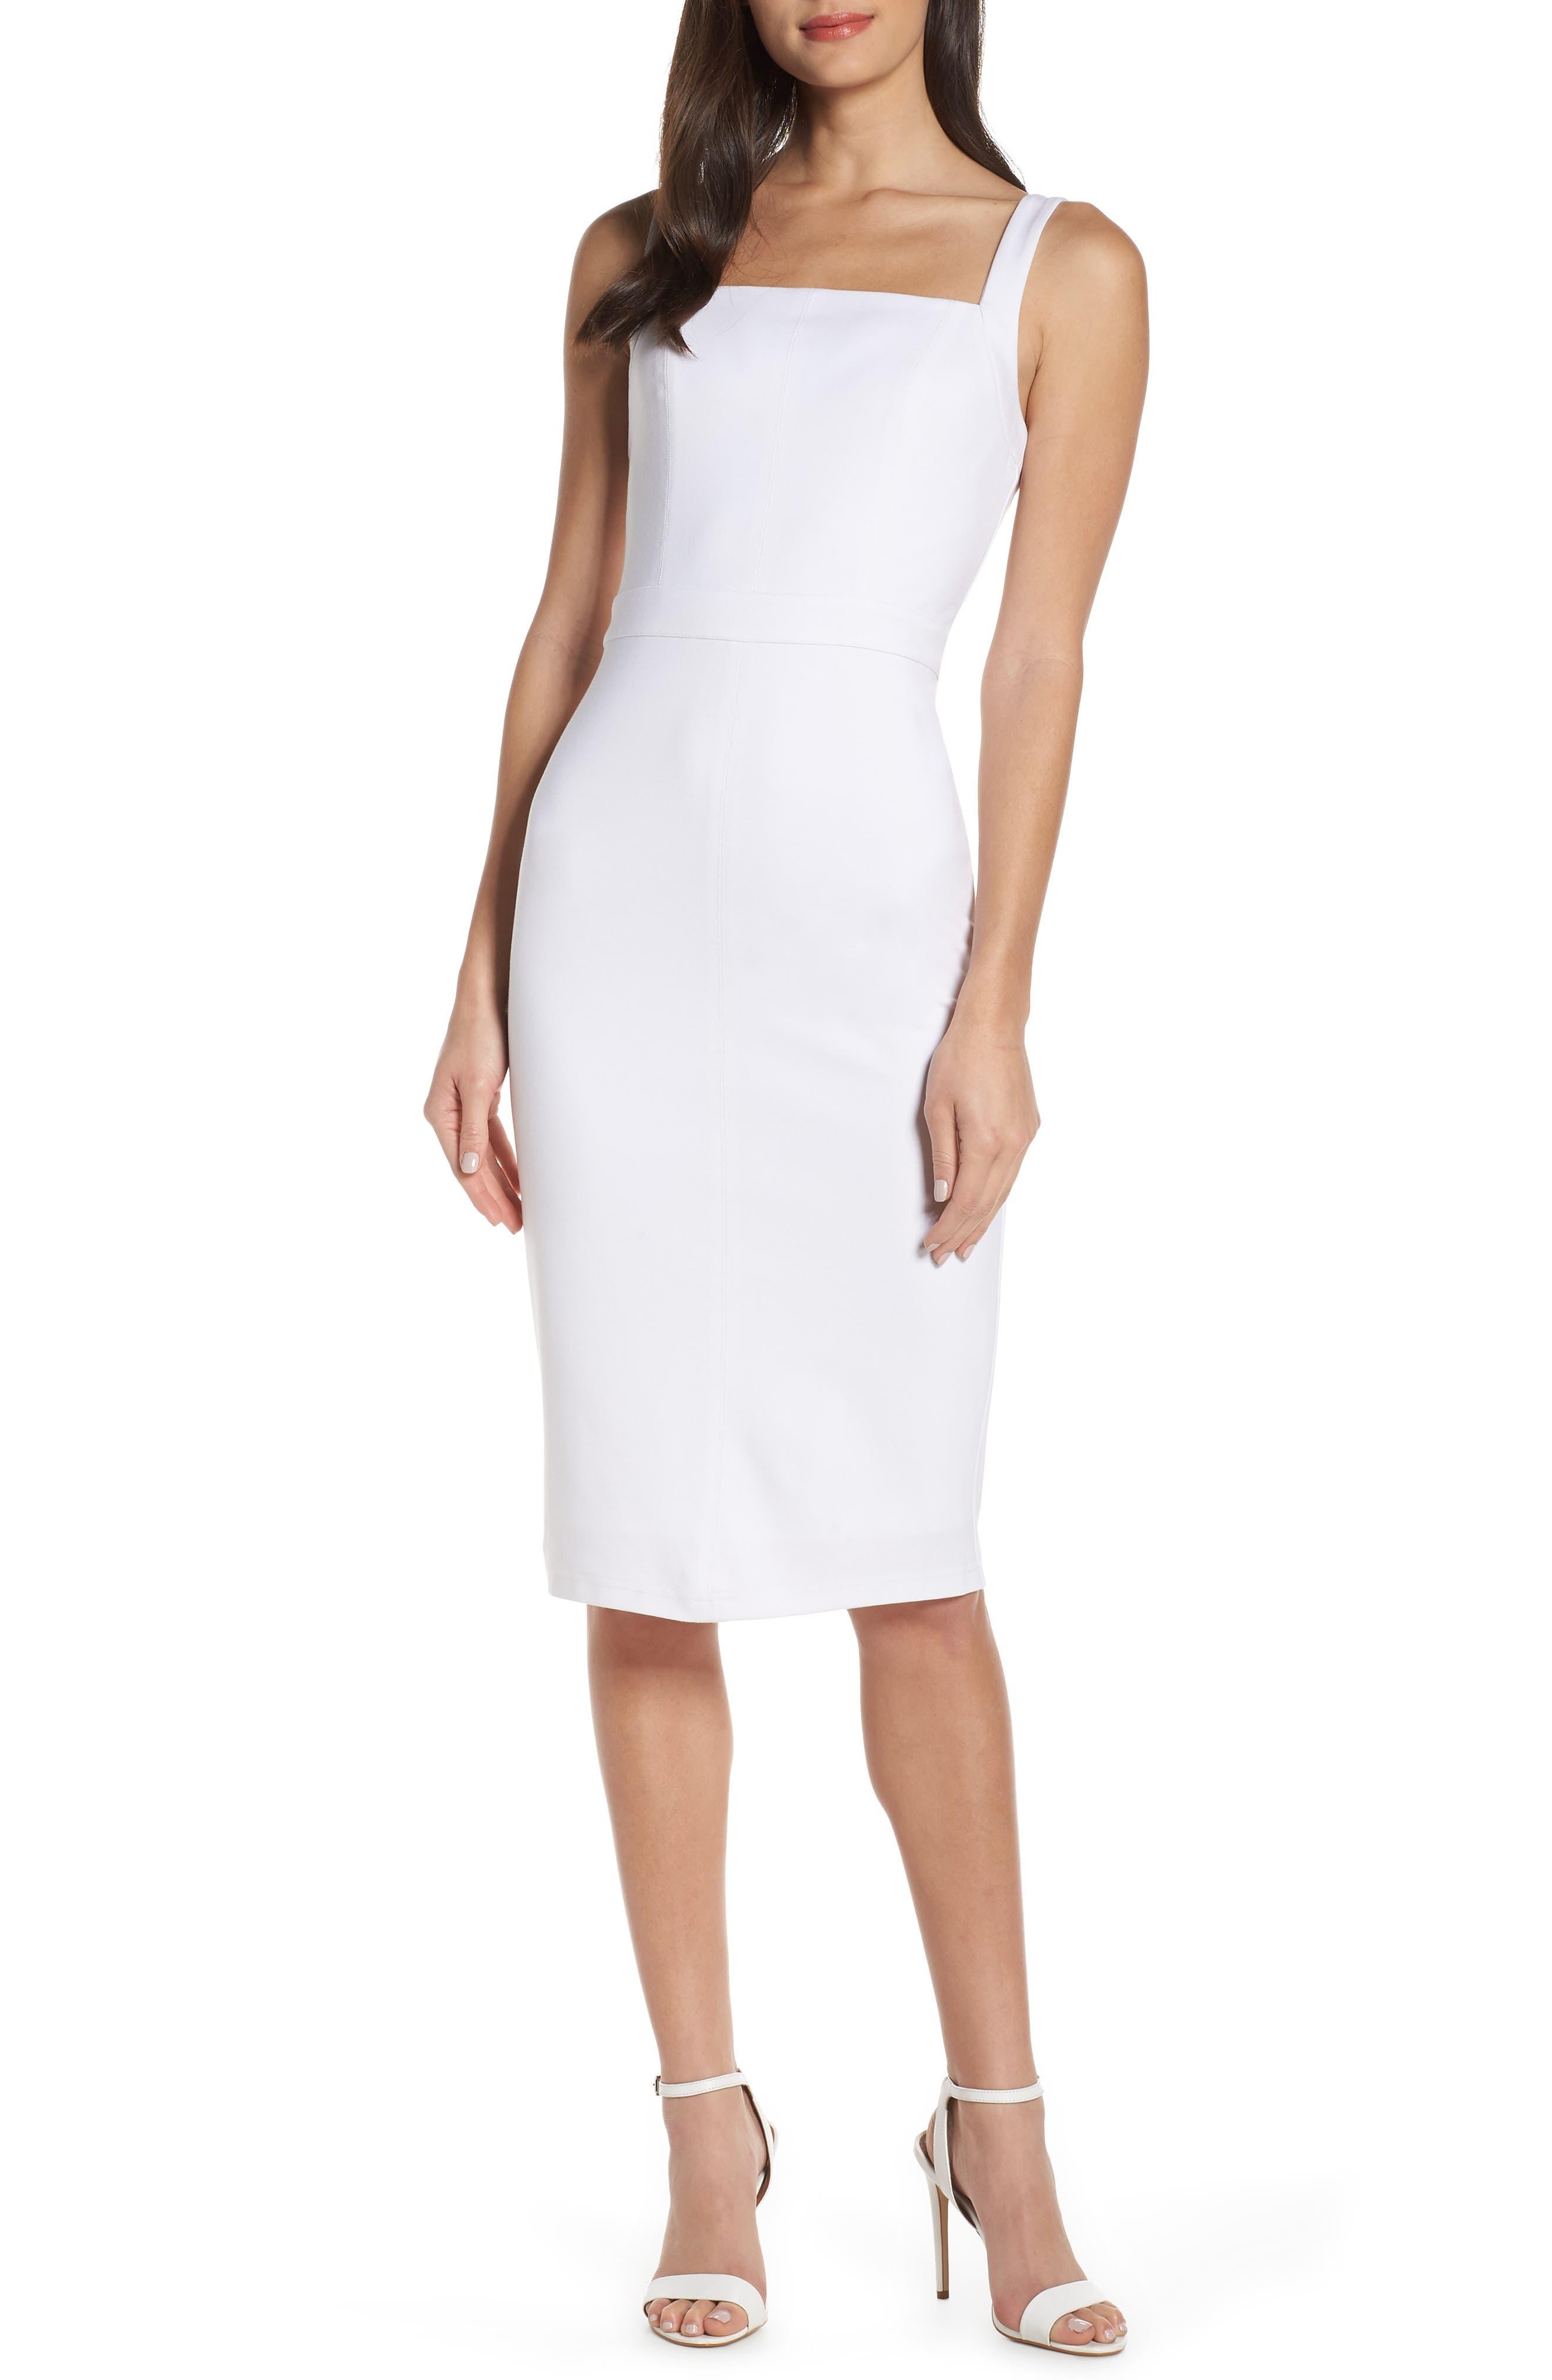 Ali & Jay Wisteria Wandering Sheath Dress, White